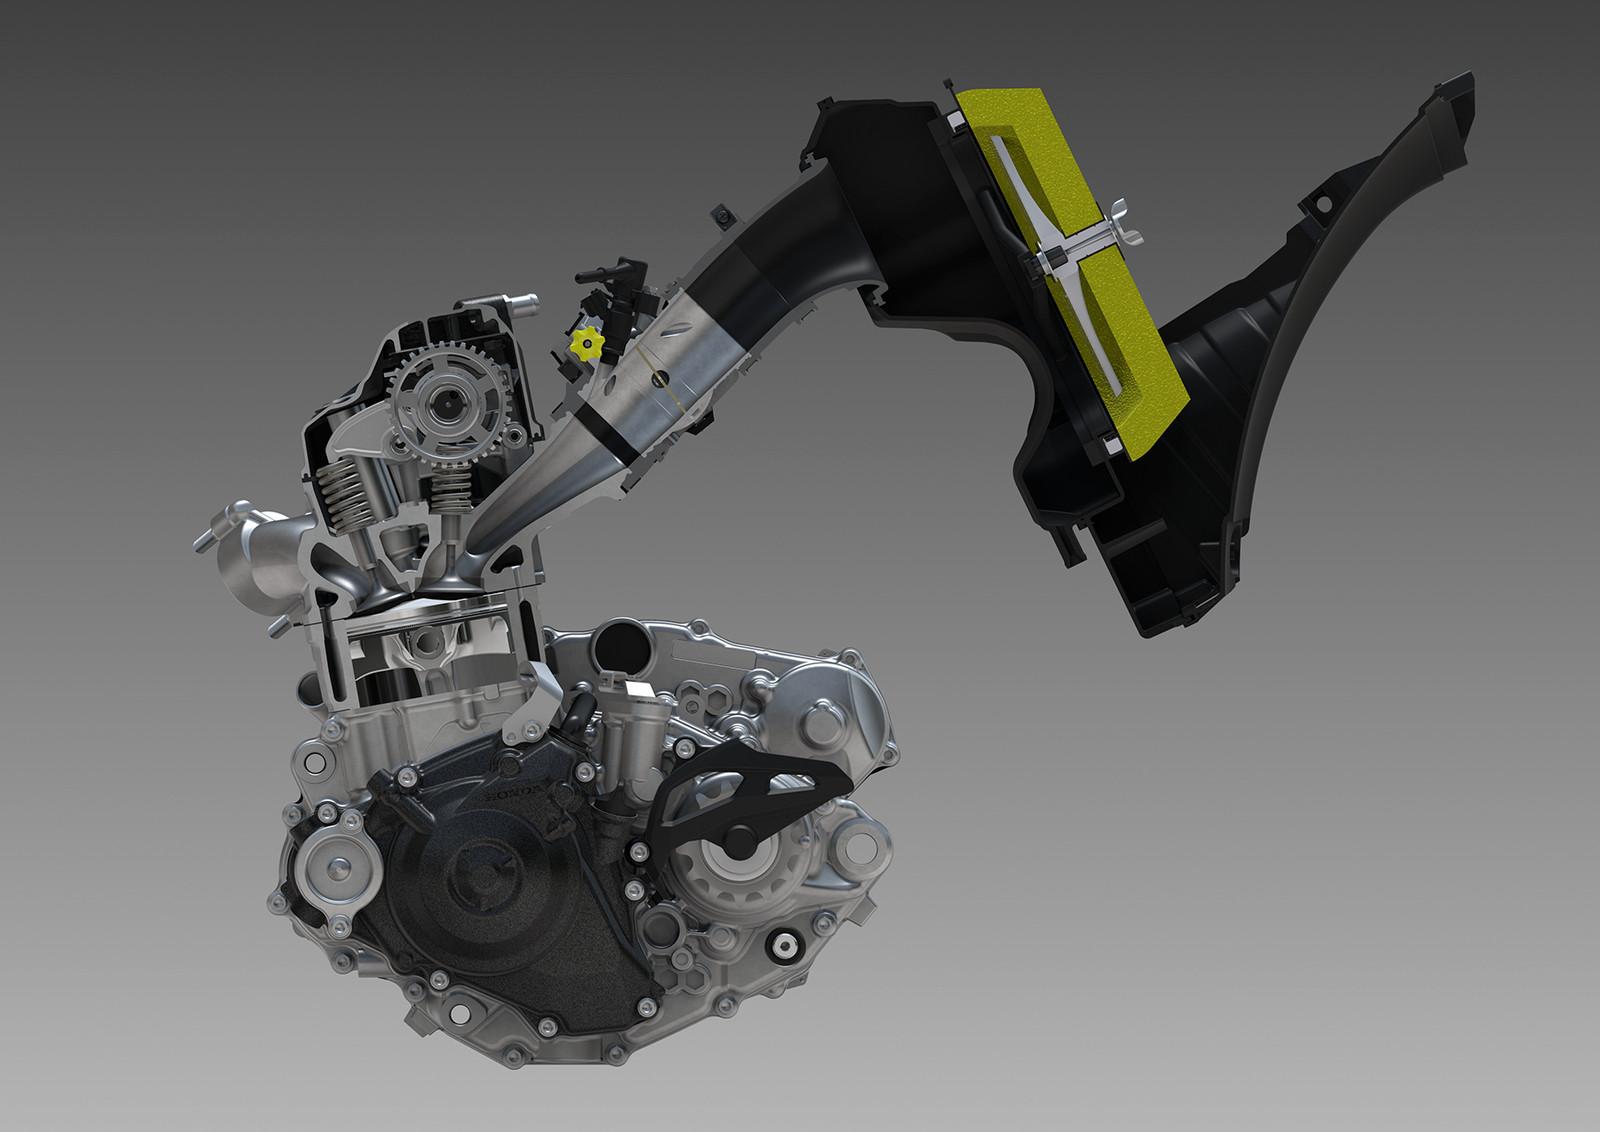 downdraft intake layout increases power by reducing resistance, improving  air-charging efficiency